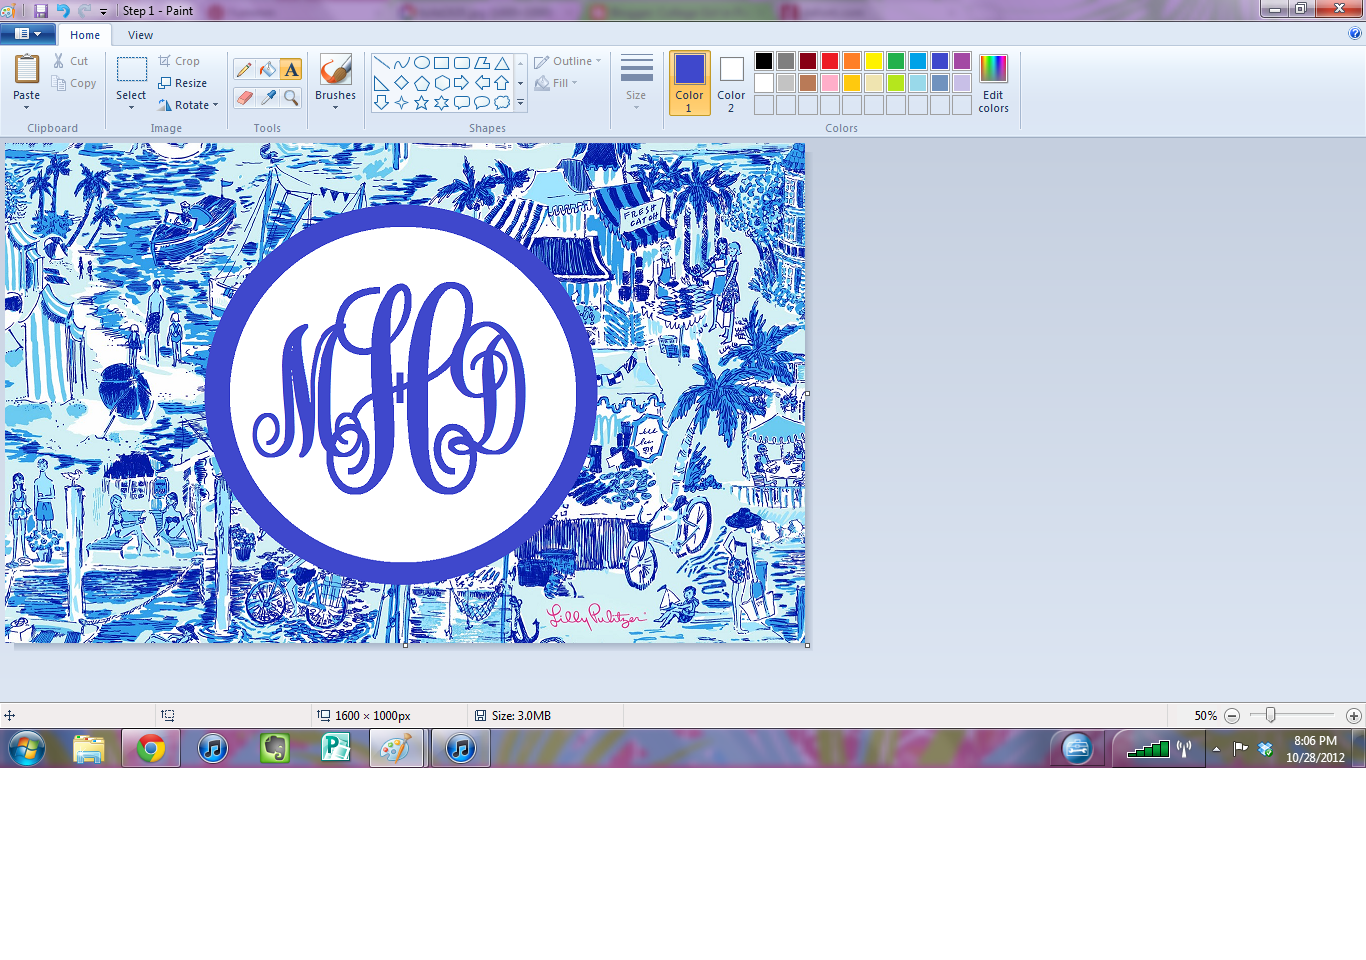 Free download in Pearls DIY Monogram Desktop Backgrounds